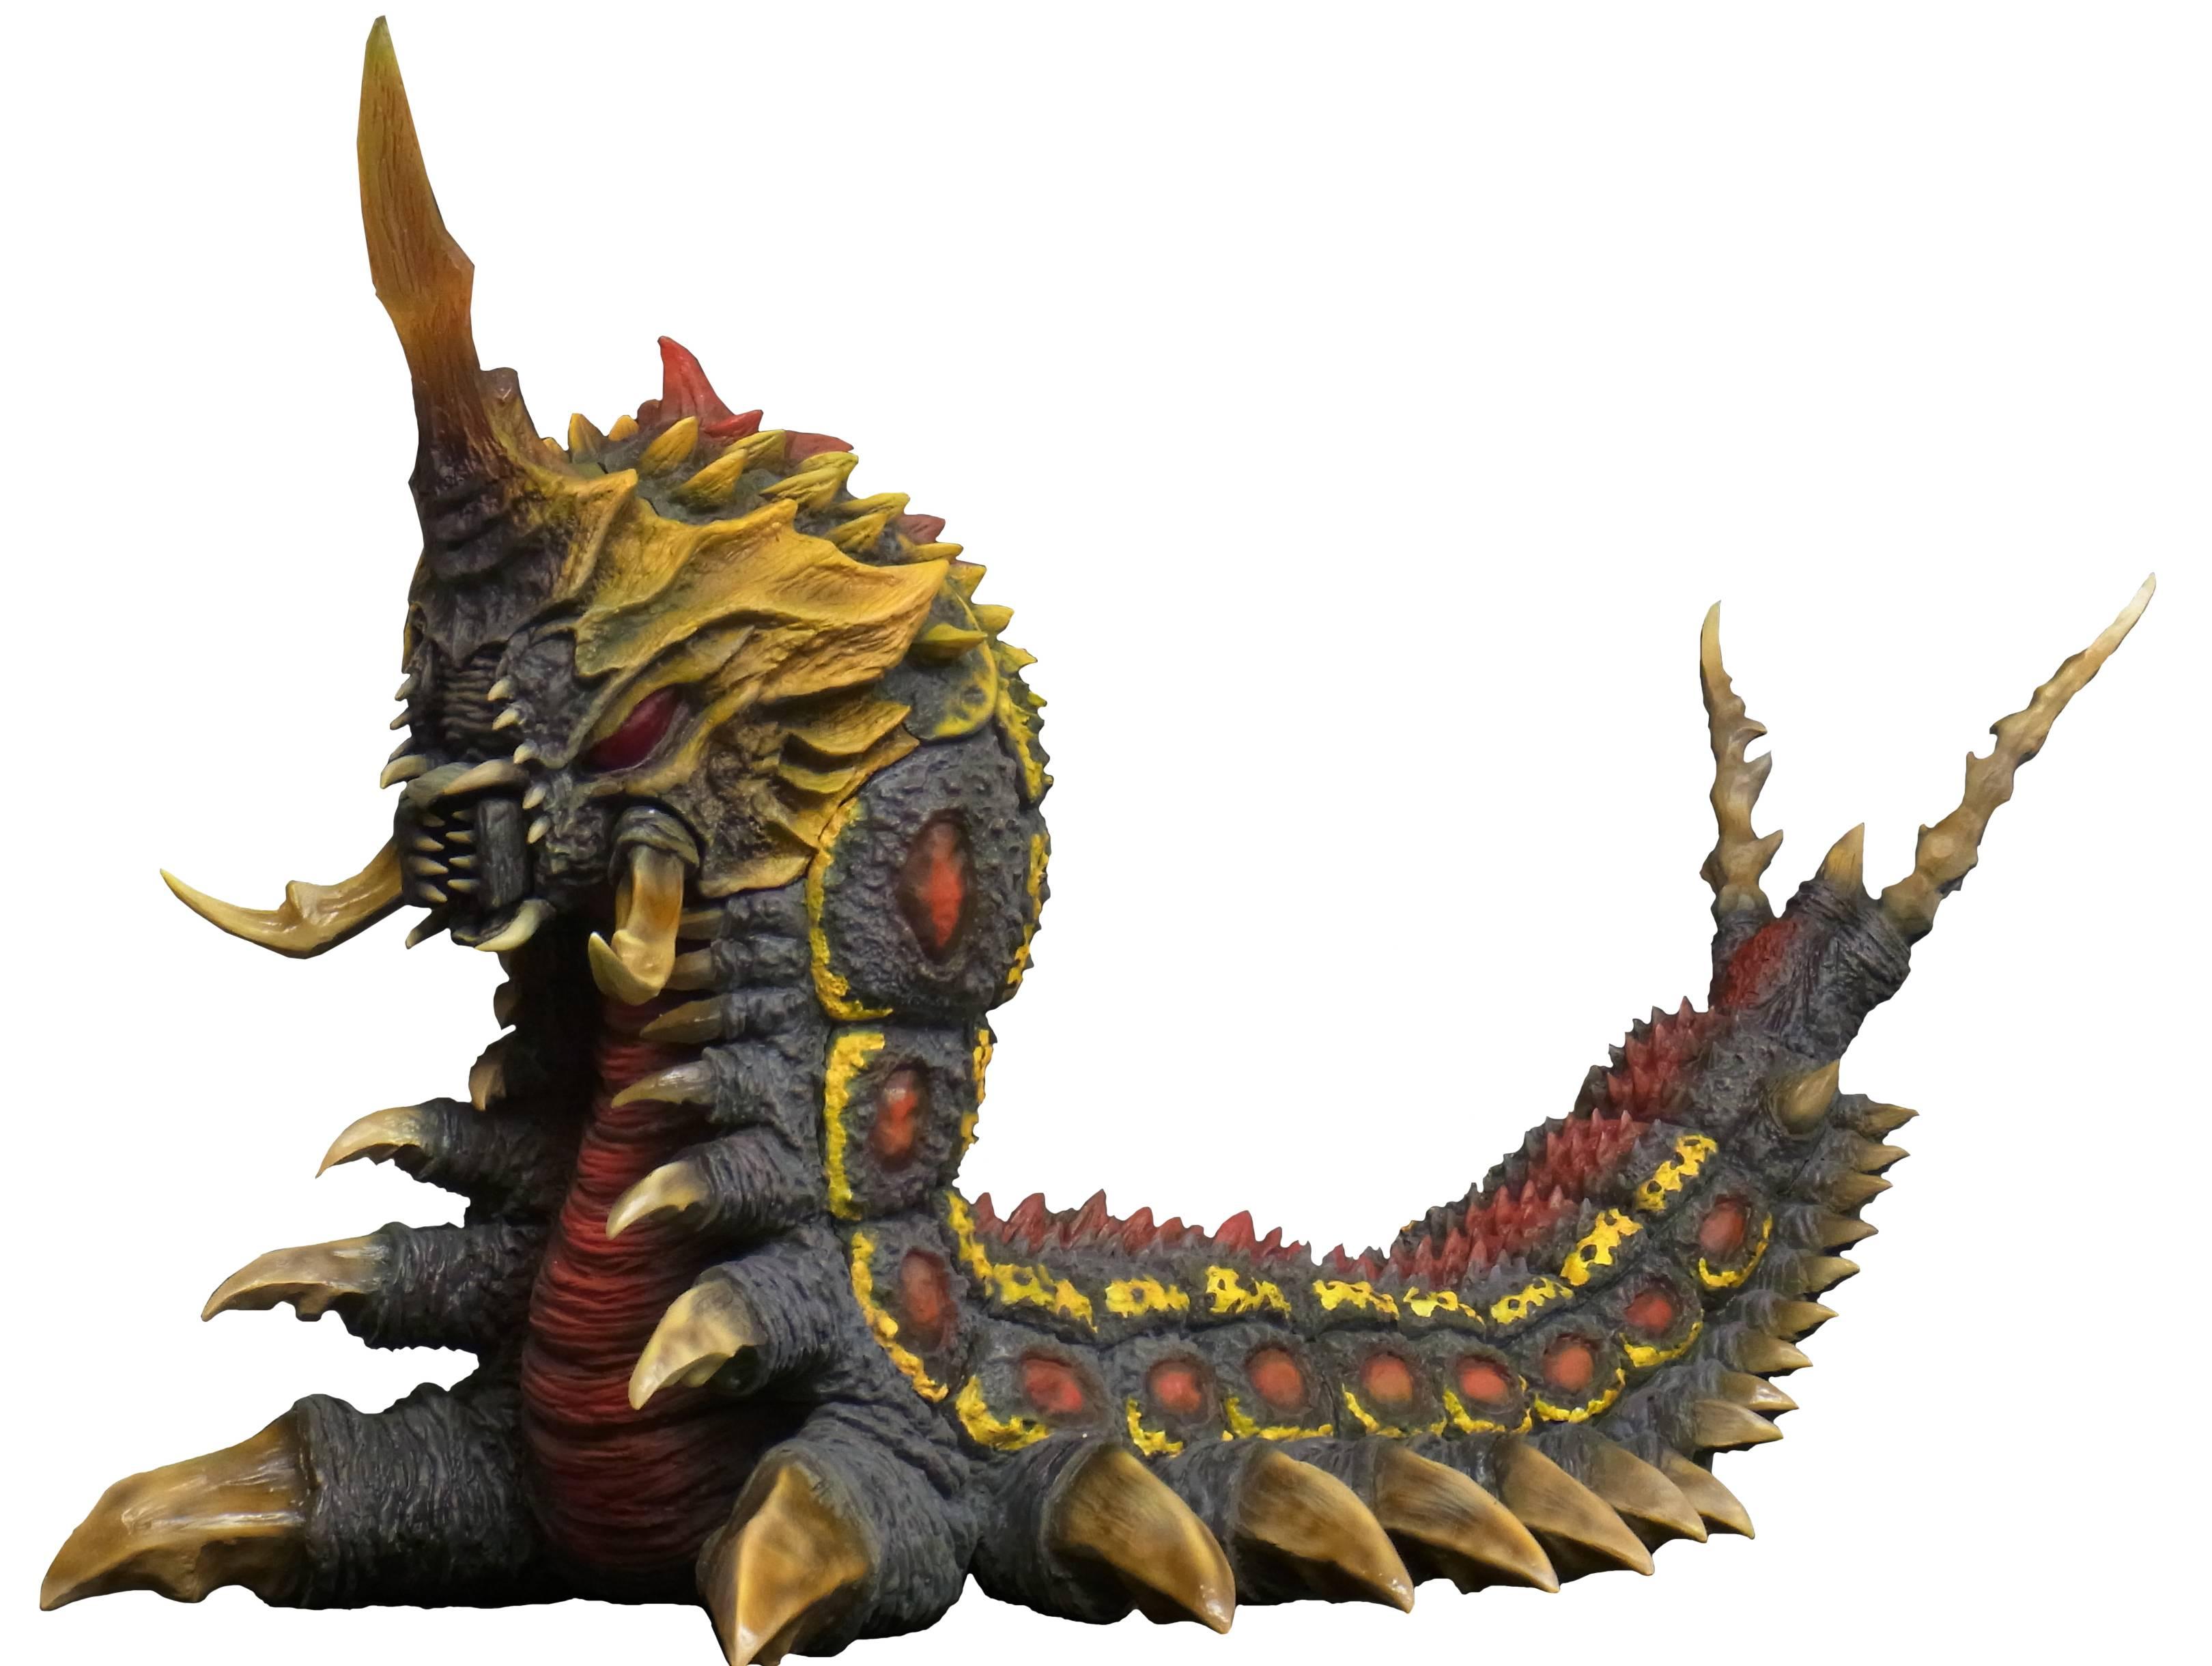 Toys More Godzilla Toys On The Way From Diamond Comics